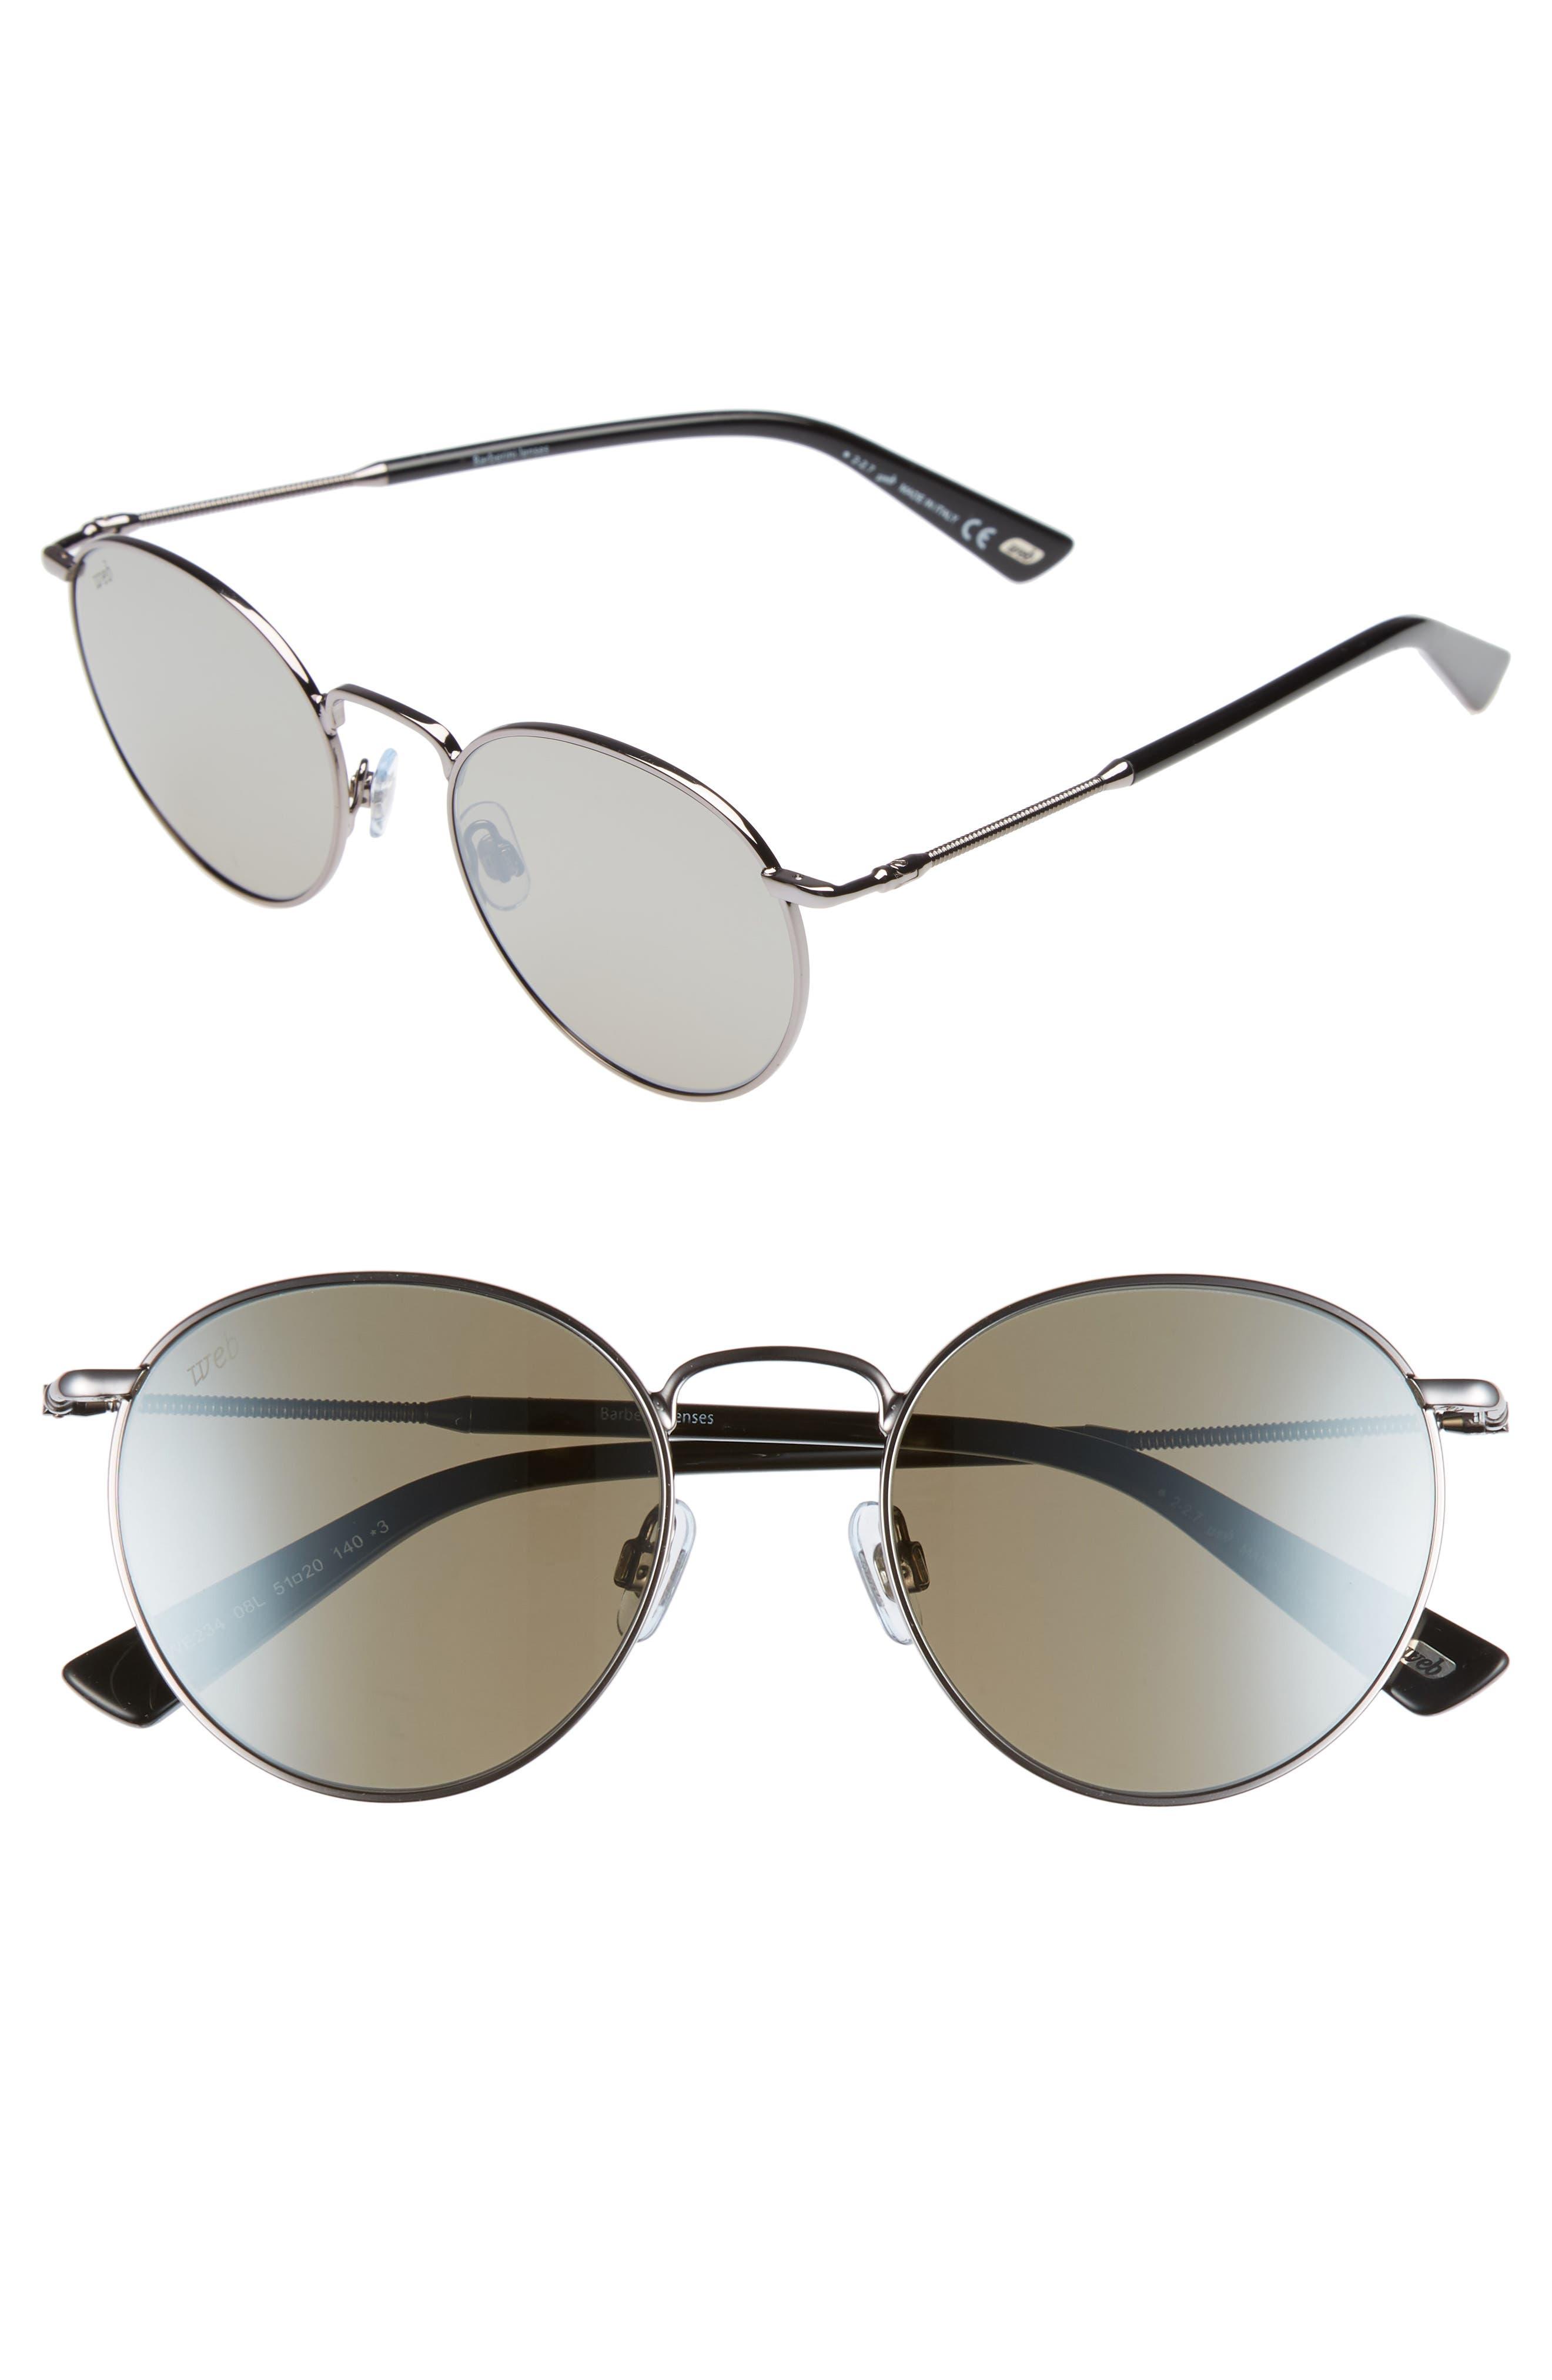 51mm Round Metal Sunglasses,                             Main thumbnail 1, color,                             SHINY GUNMETAL/ ROVIEX MIRROR